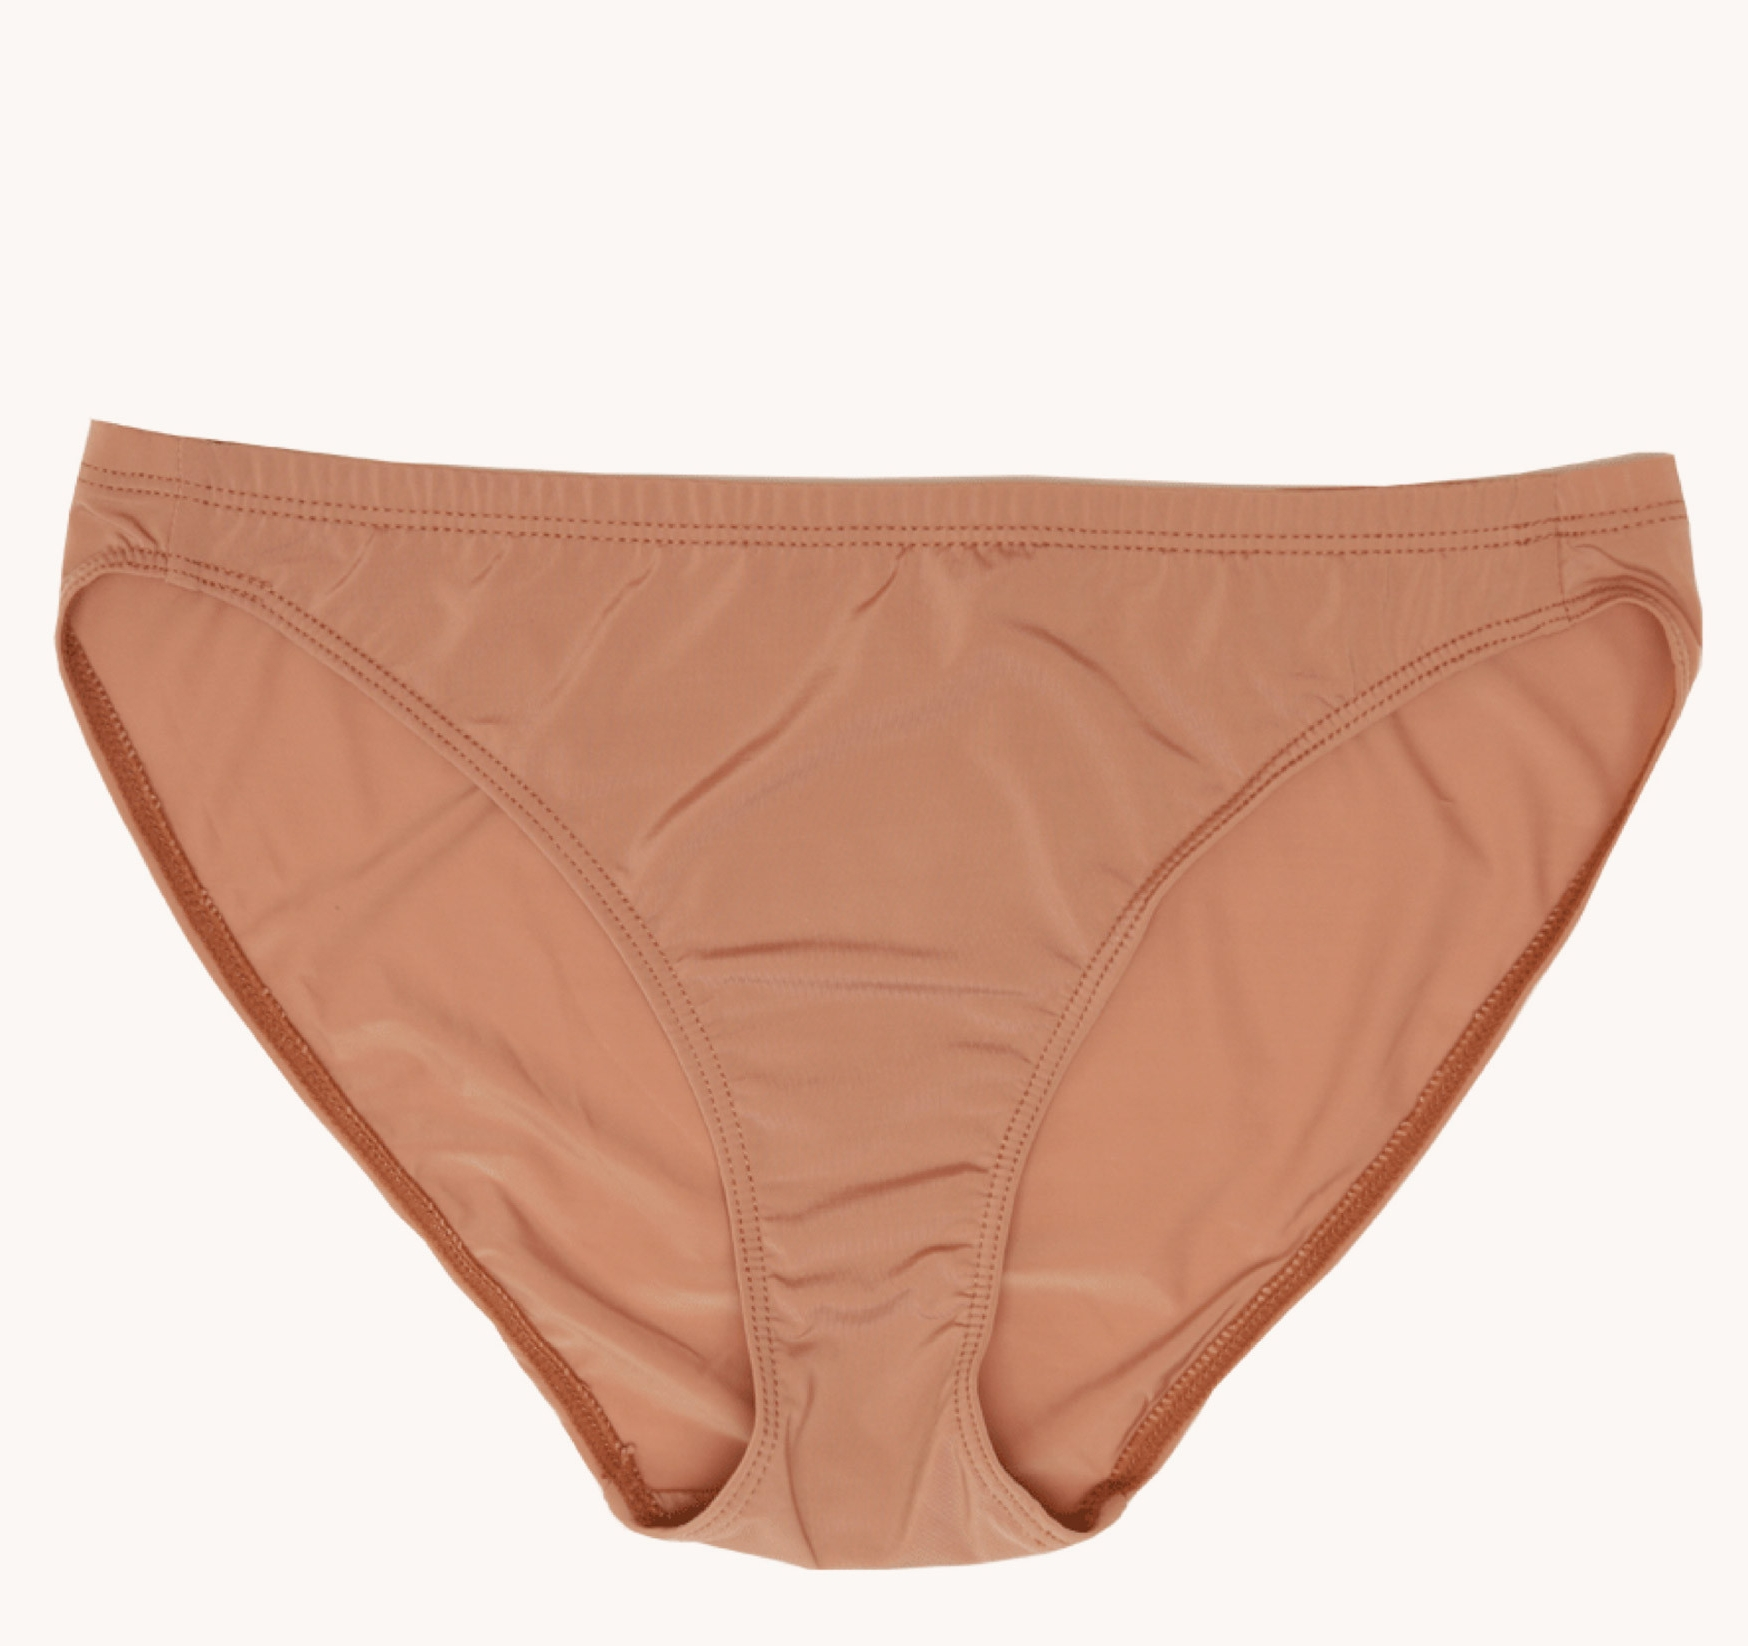 Super soft bikini